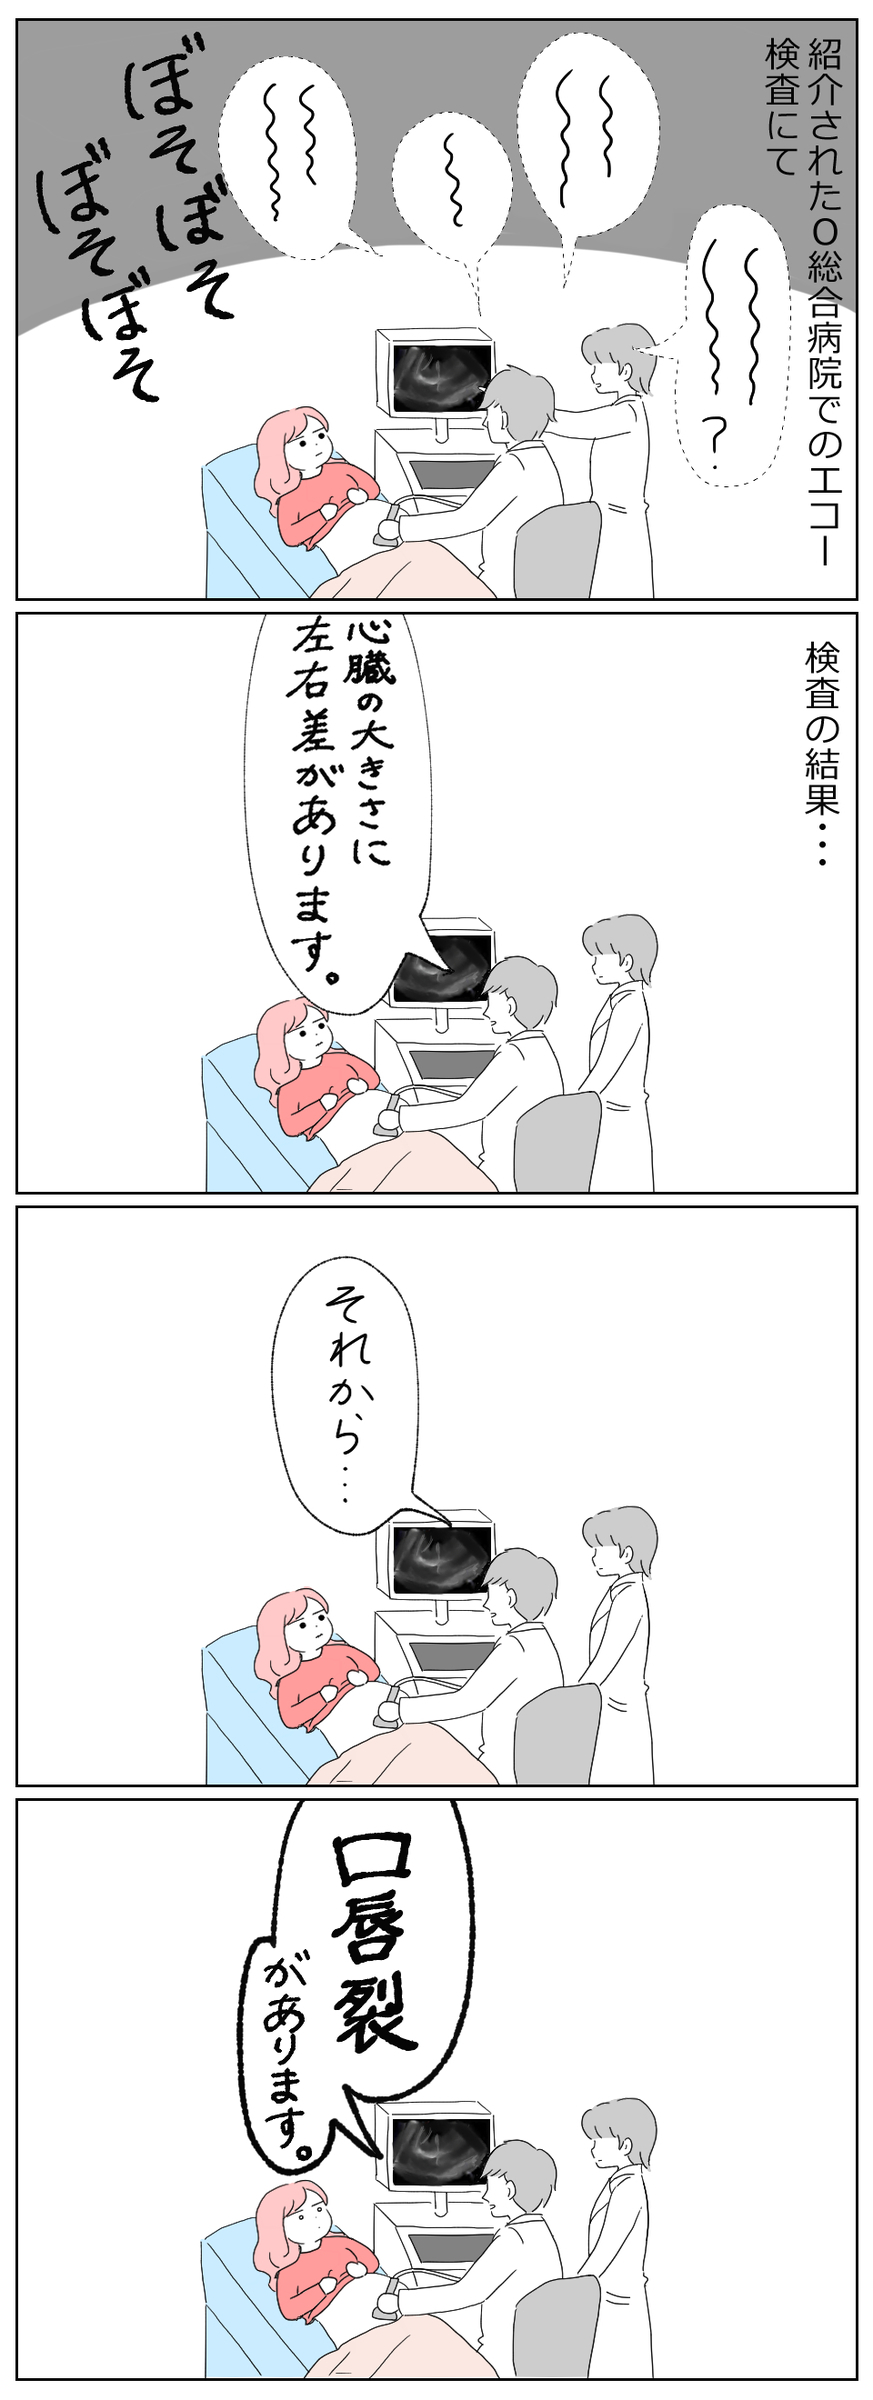 f:id:kayarimo:20190315220302j:plain